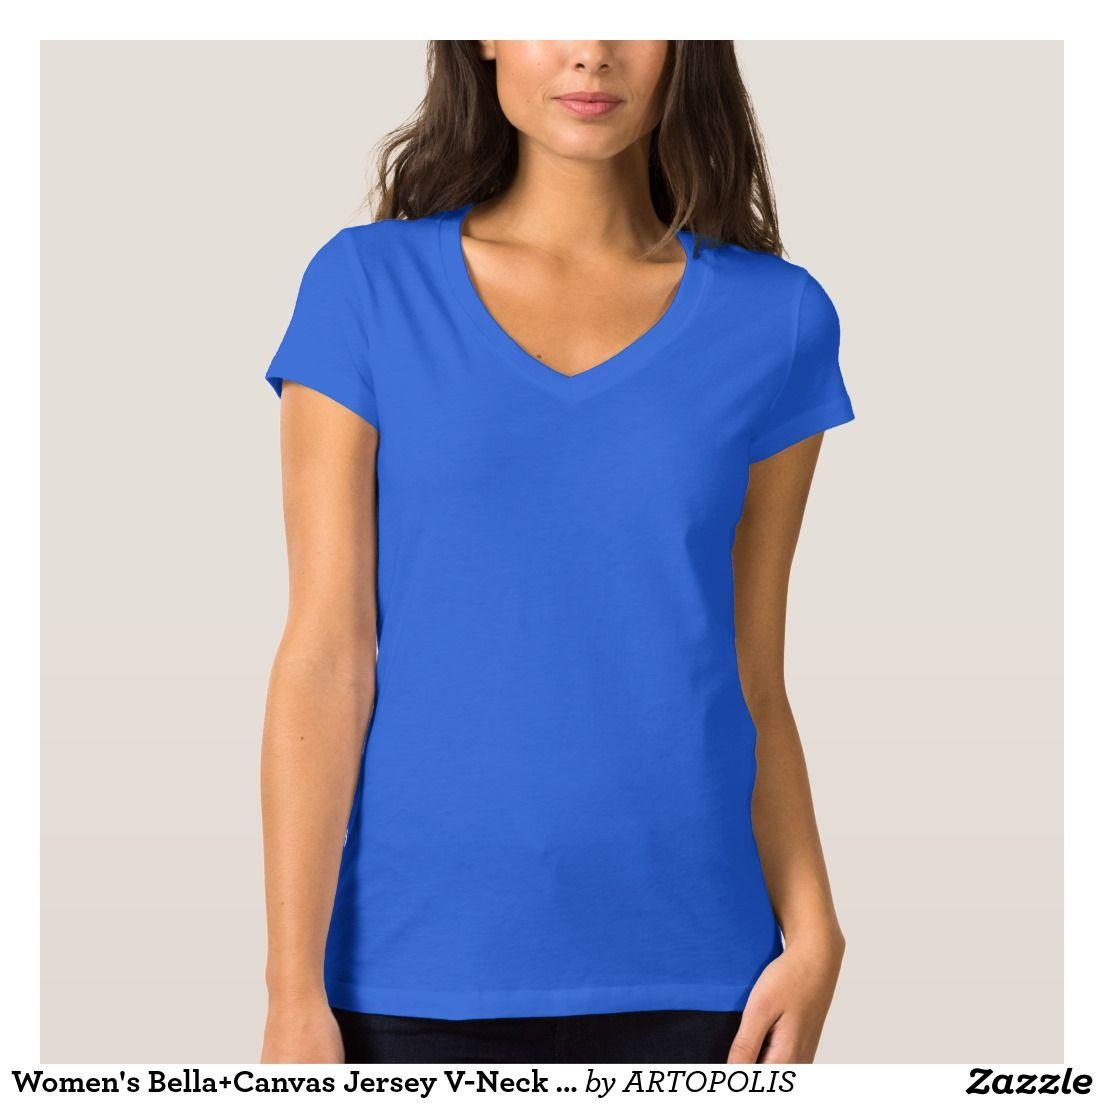 Women's Bella+Canvas Jersey V-Neck TRUE ROYAL T-Shirt